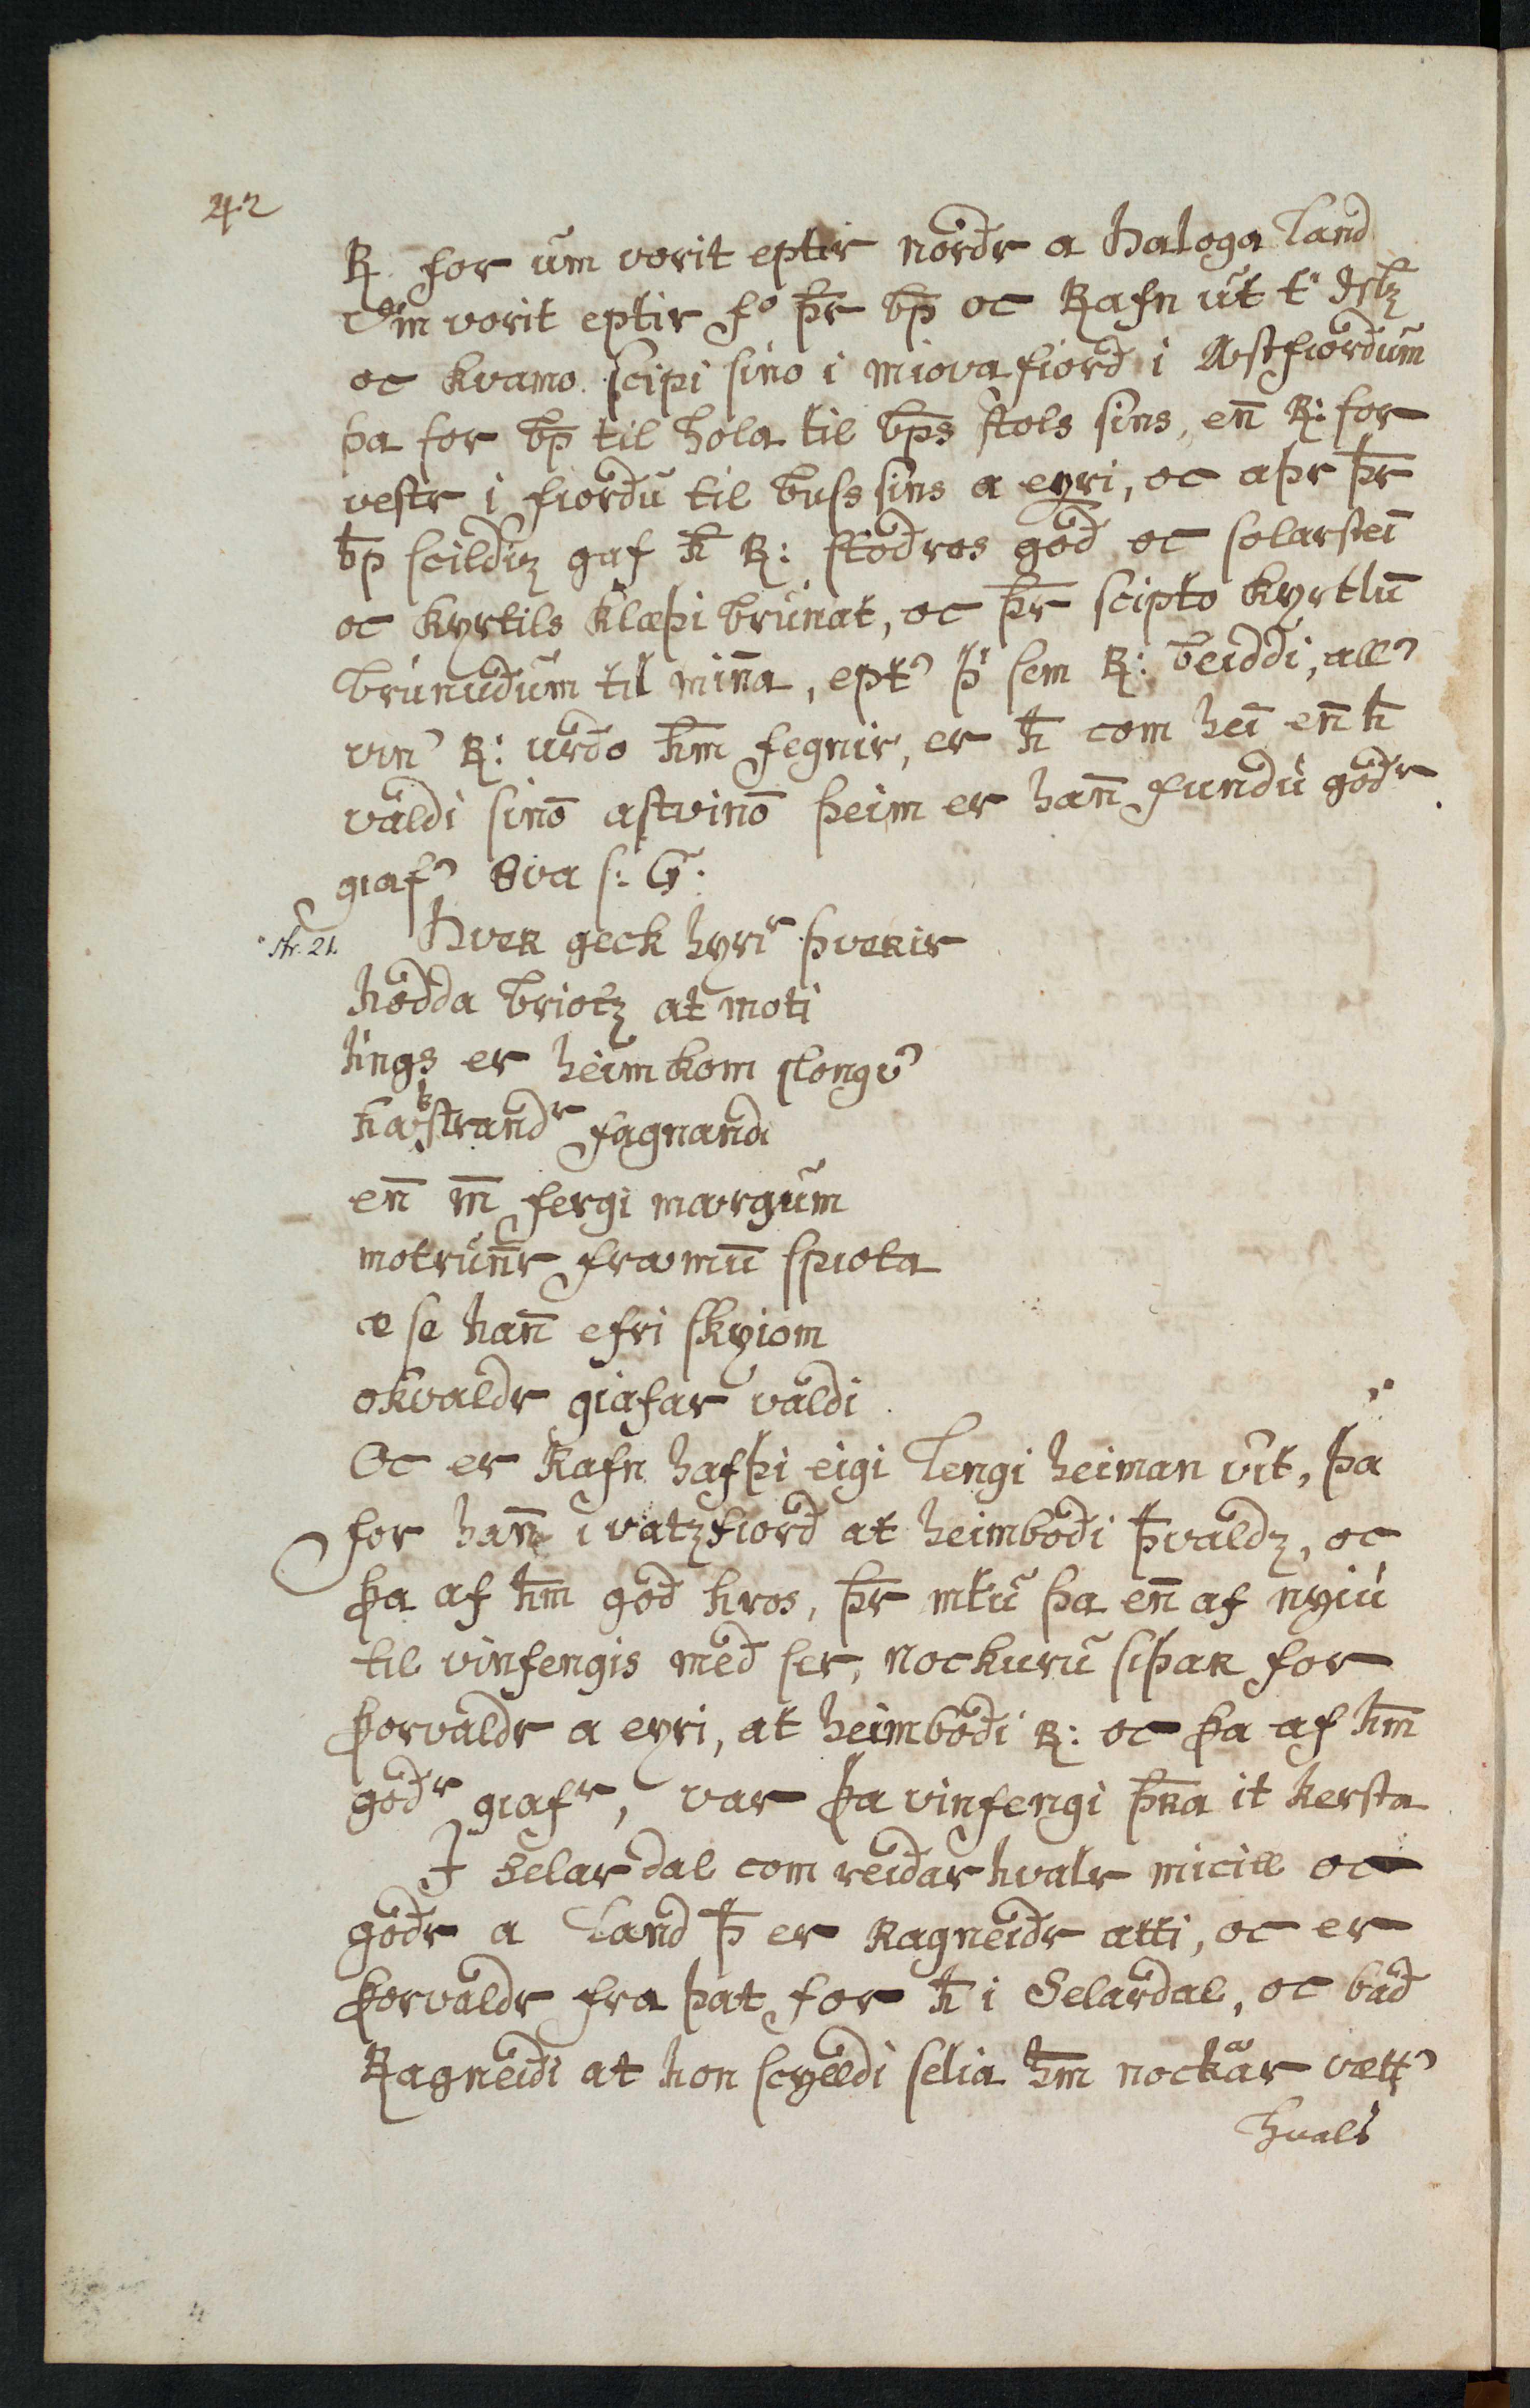 AM 154 fol - 16v